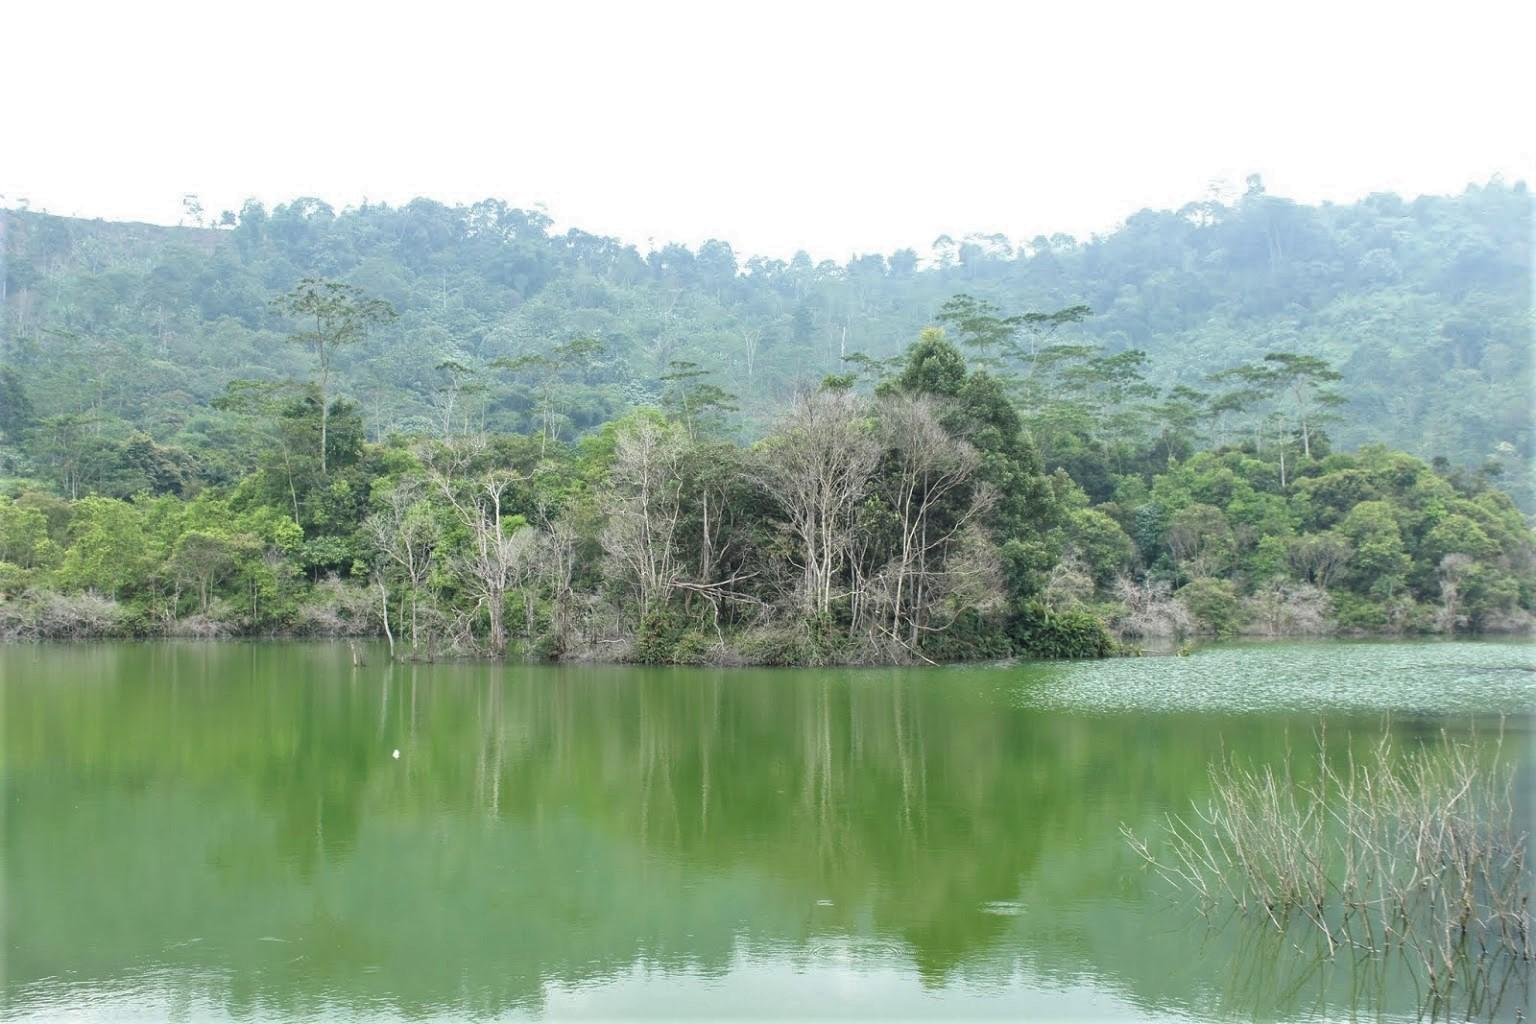 Danau Hijau